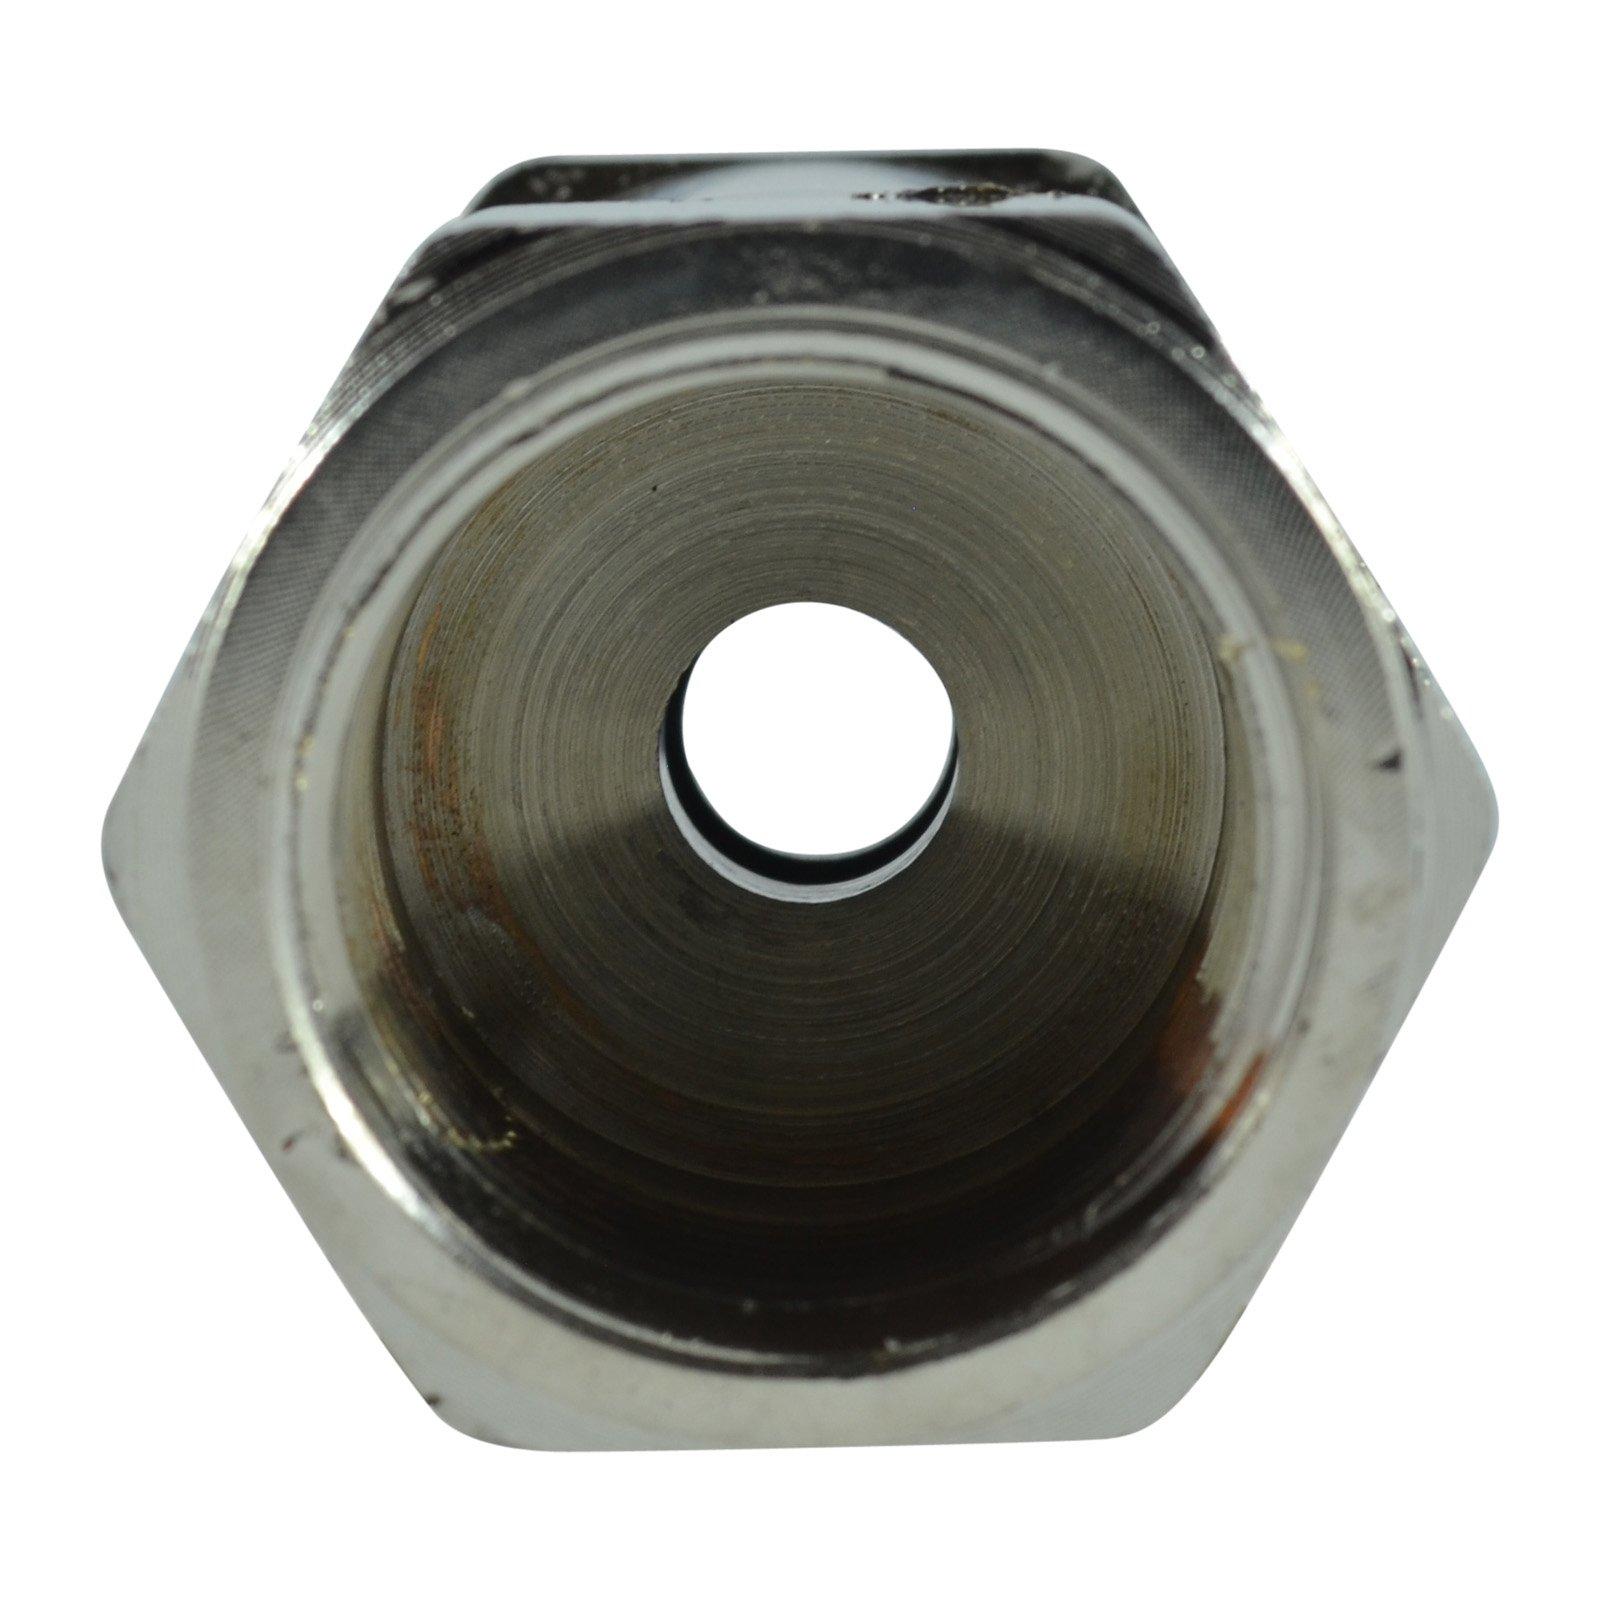 Dole Flow Regulator 3/4'' Female 4.00 GPM GC-4.00 by Dole